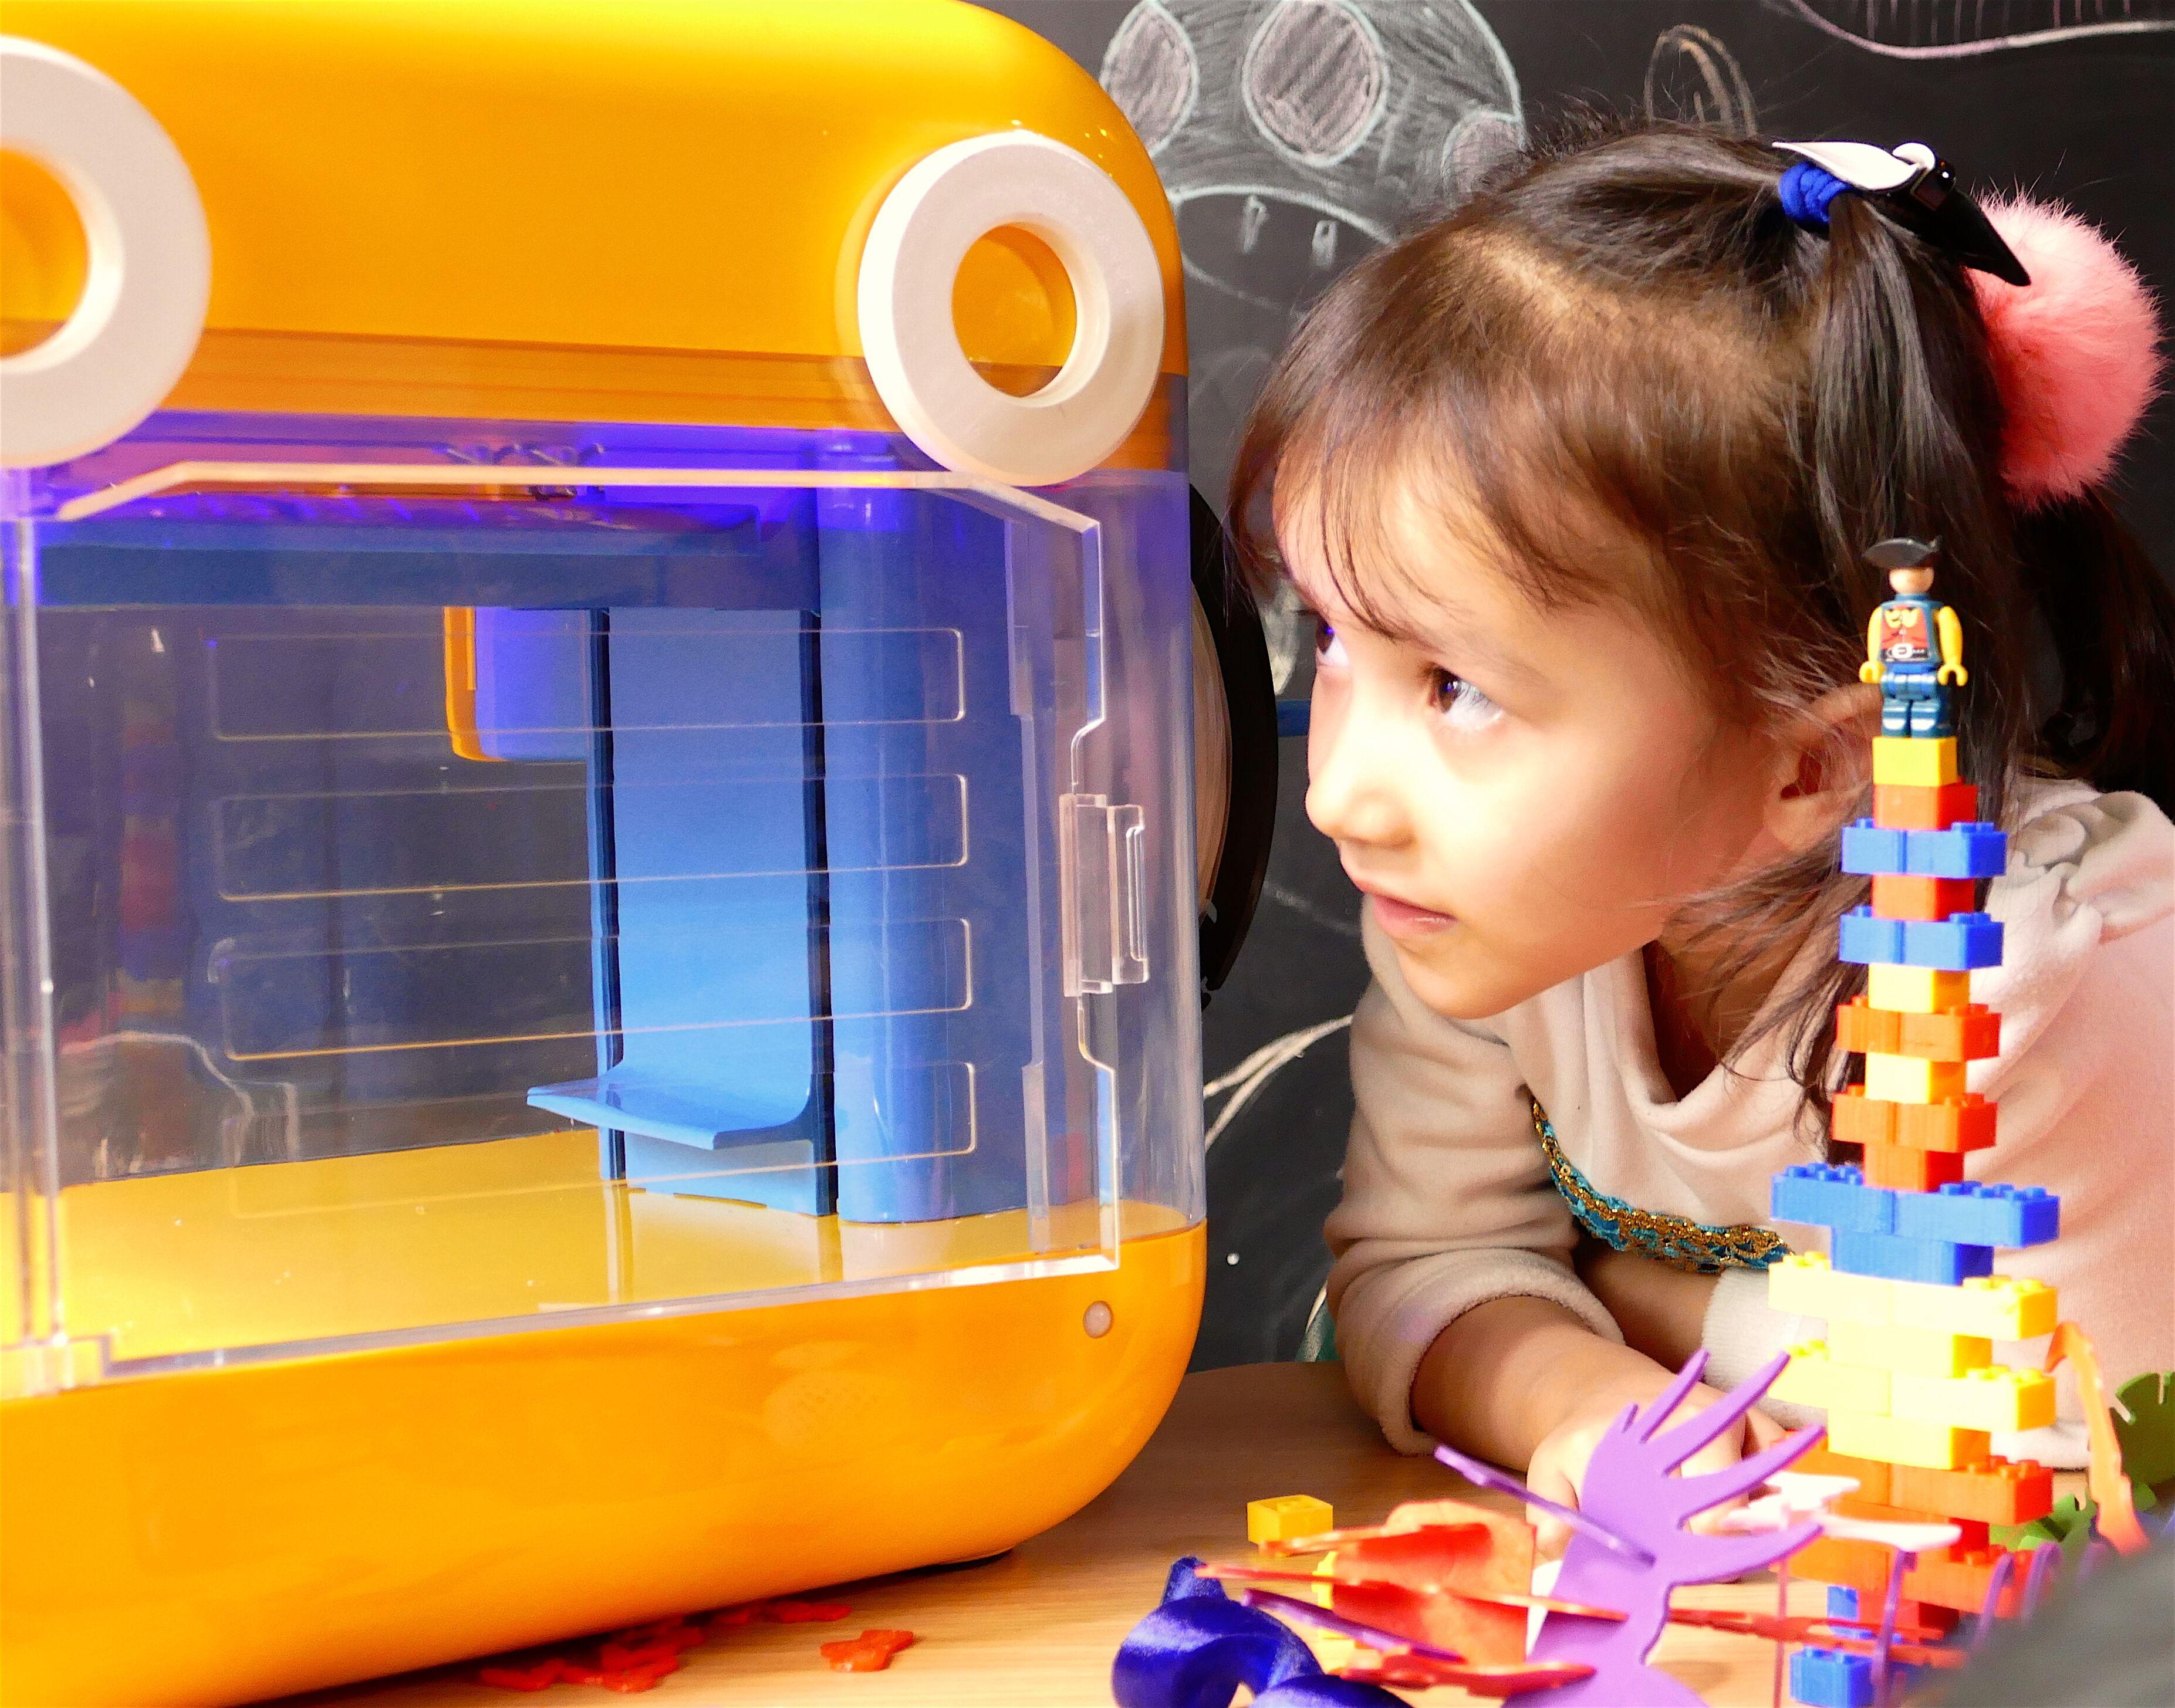 award winning 3d printer for kids coming soon to kickstarter newswire